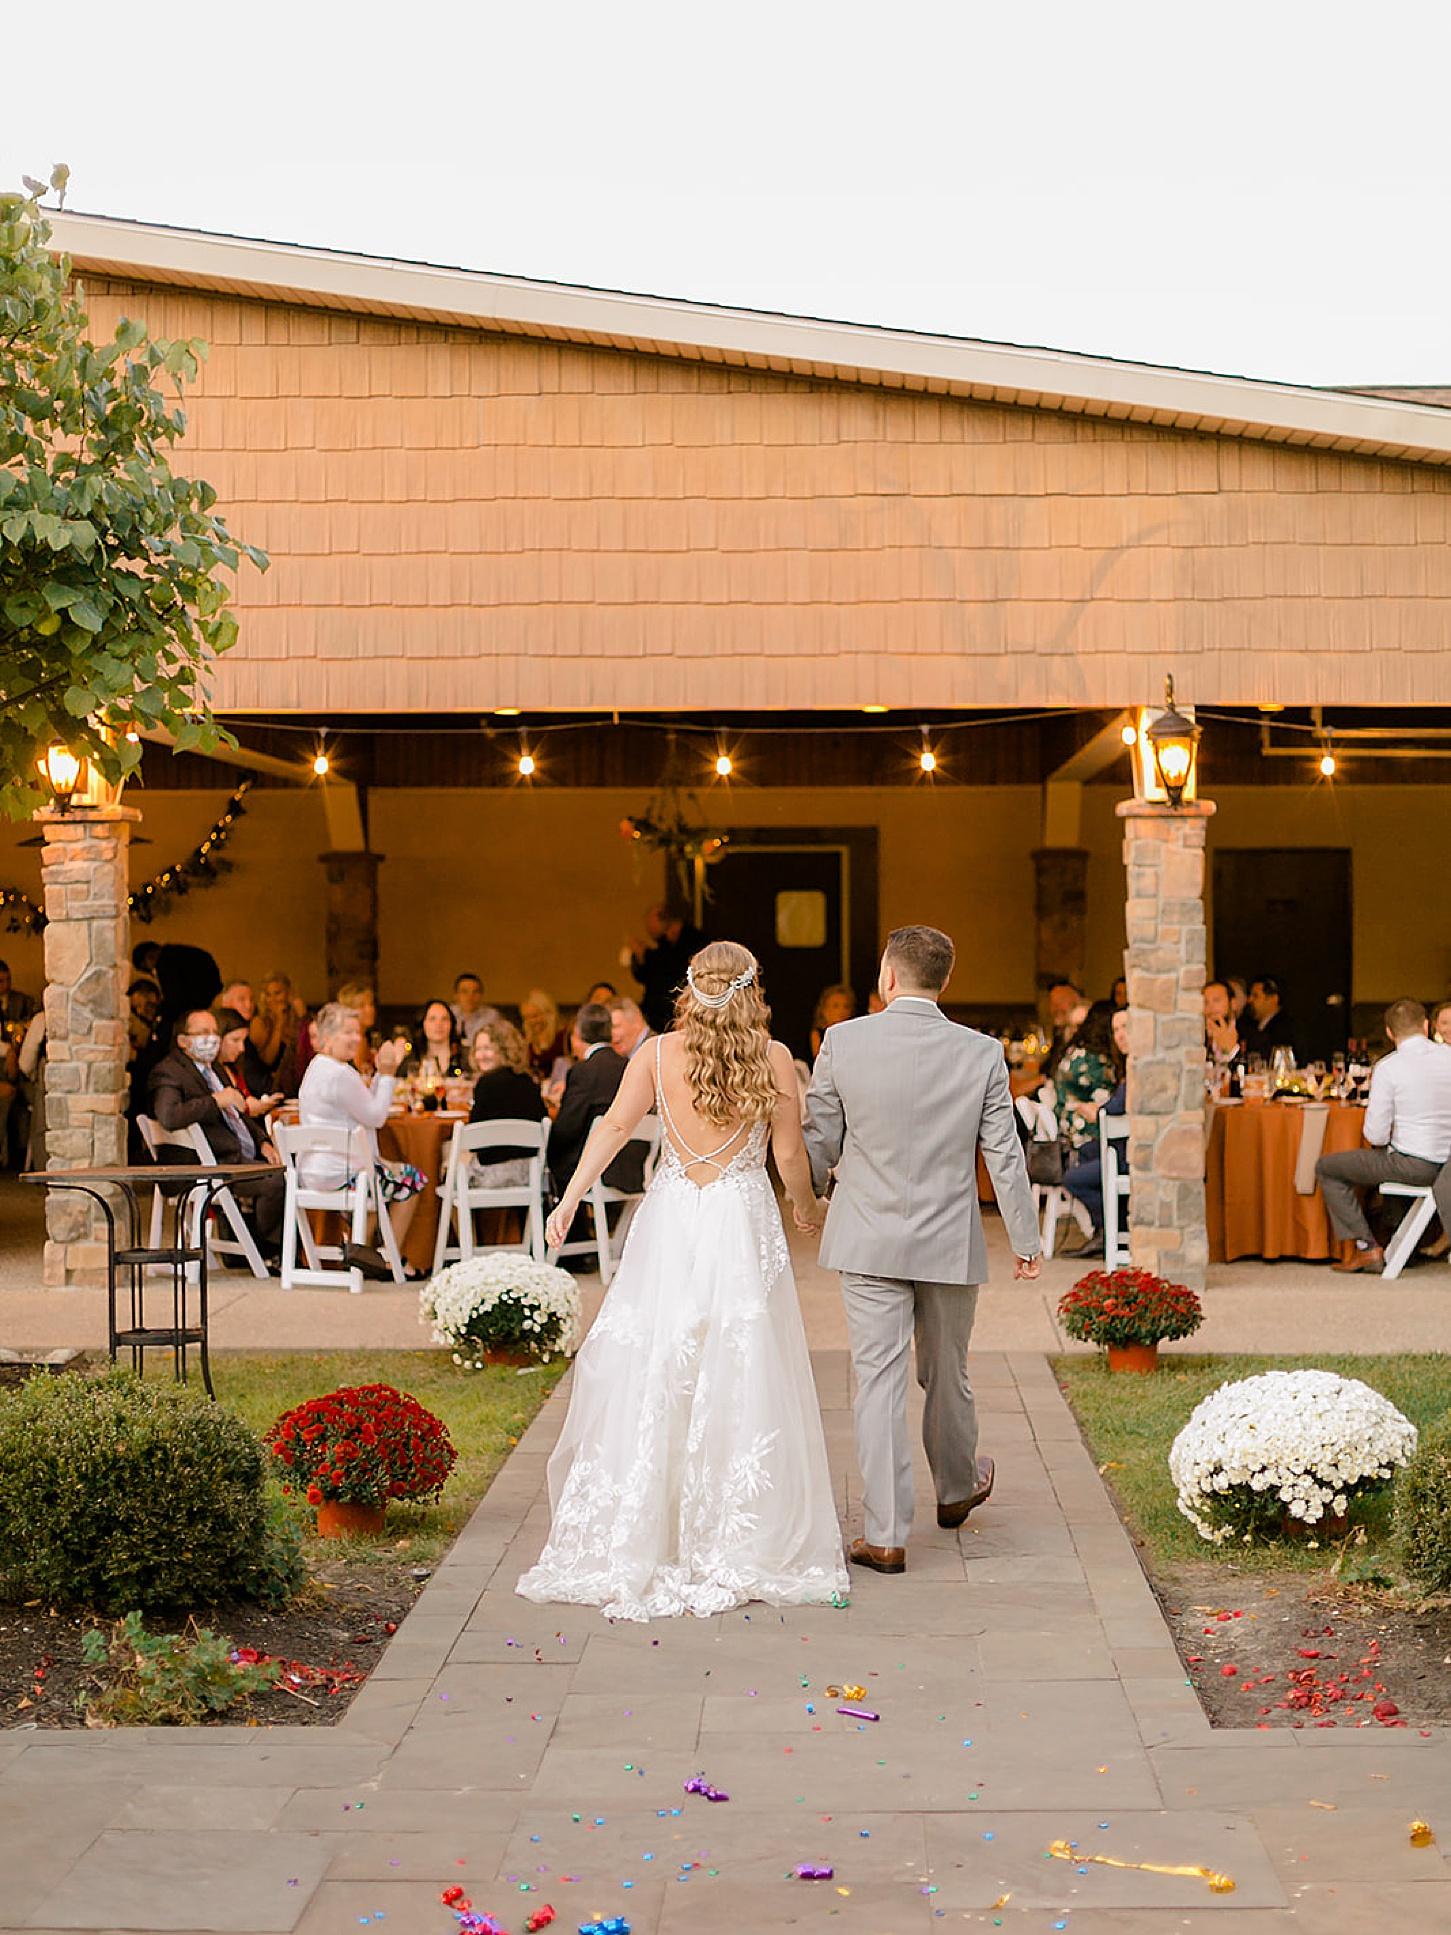 Valenzano Winery Vitners Pavillion Wedding Photography by Magdalena Studios 0040